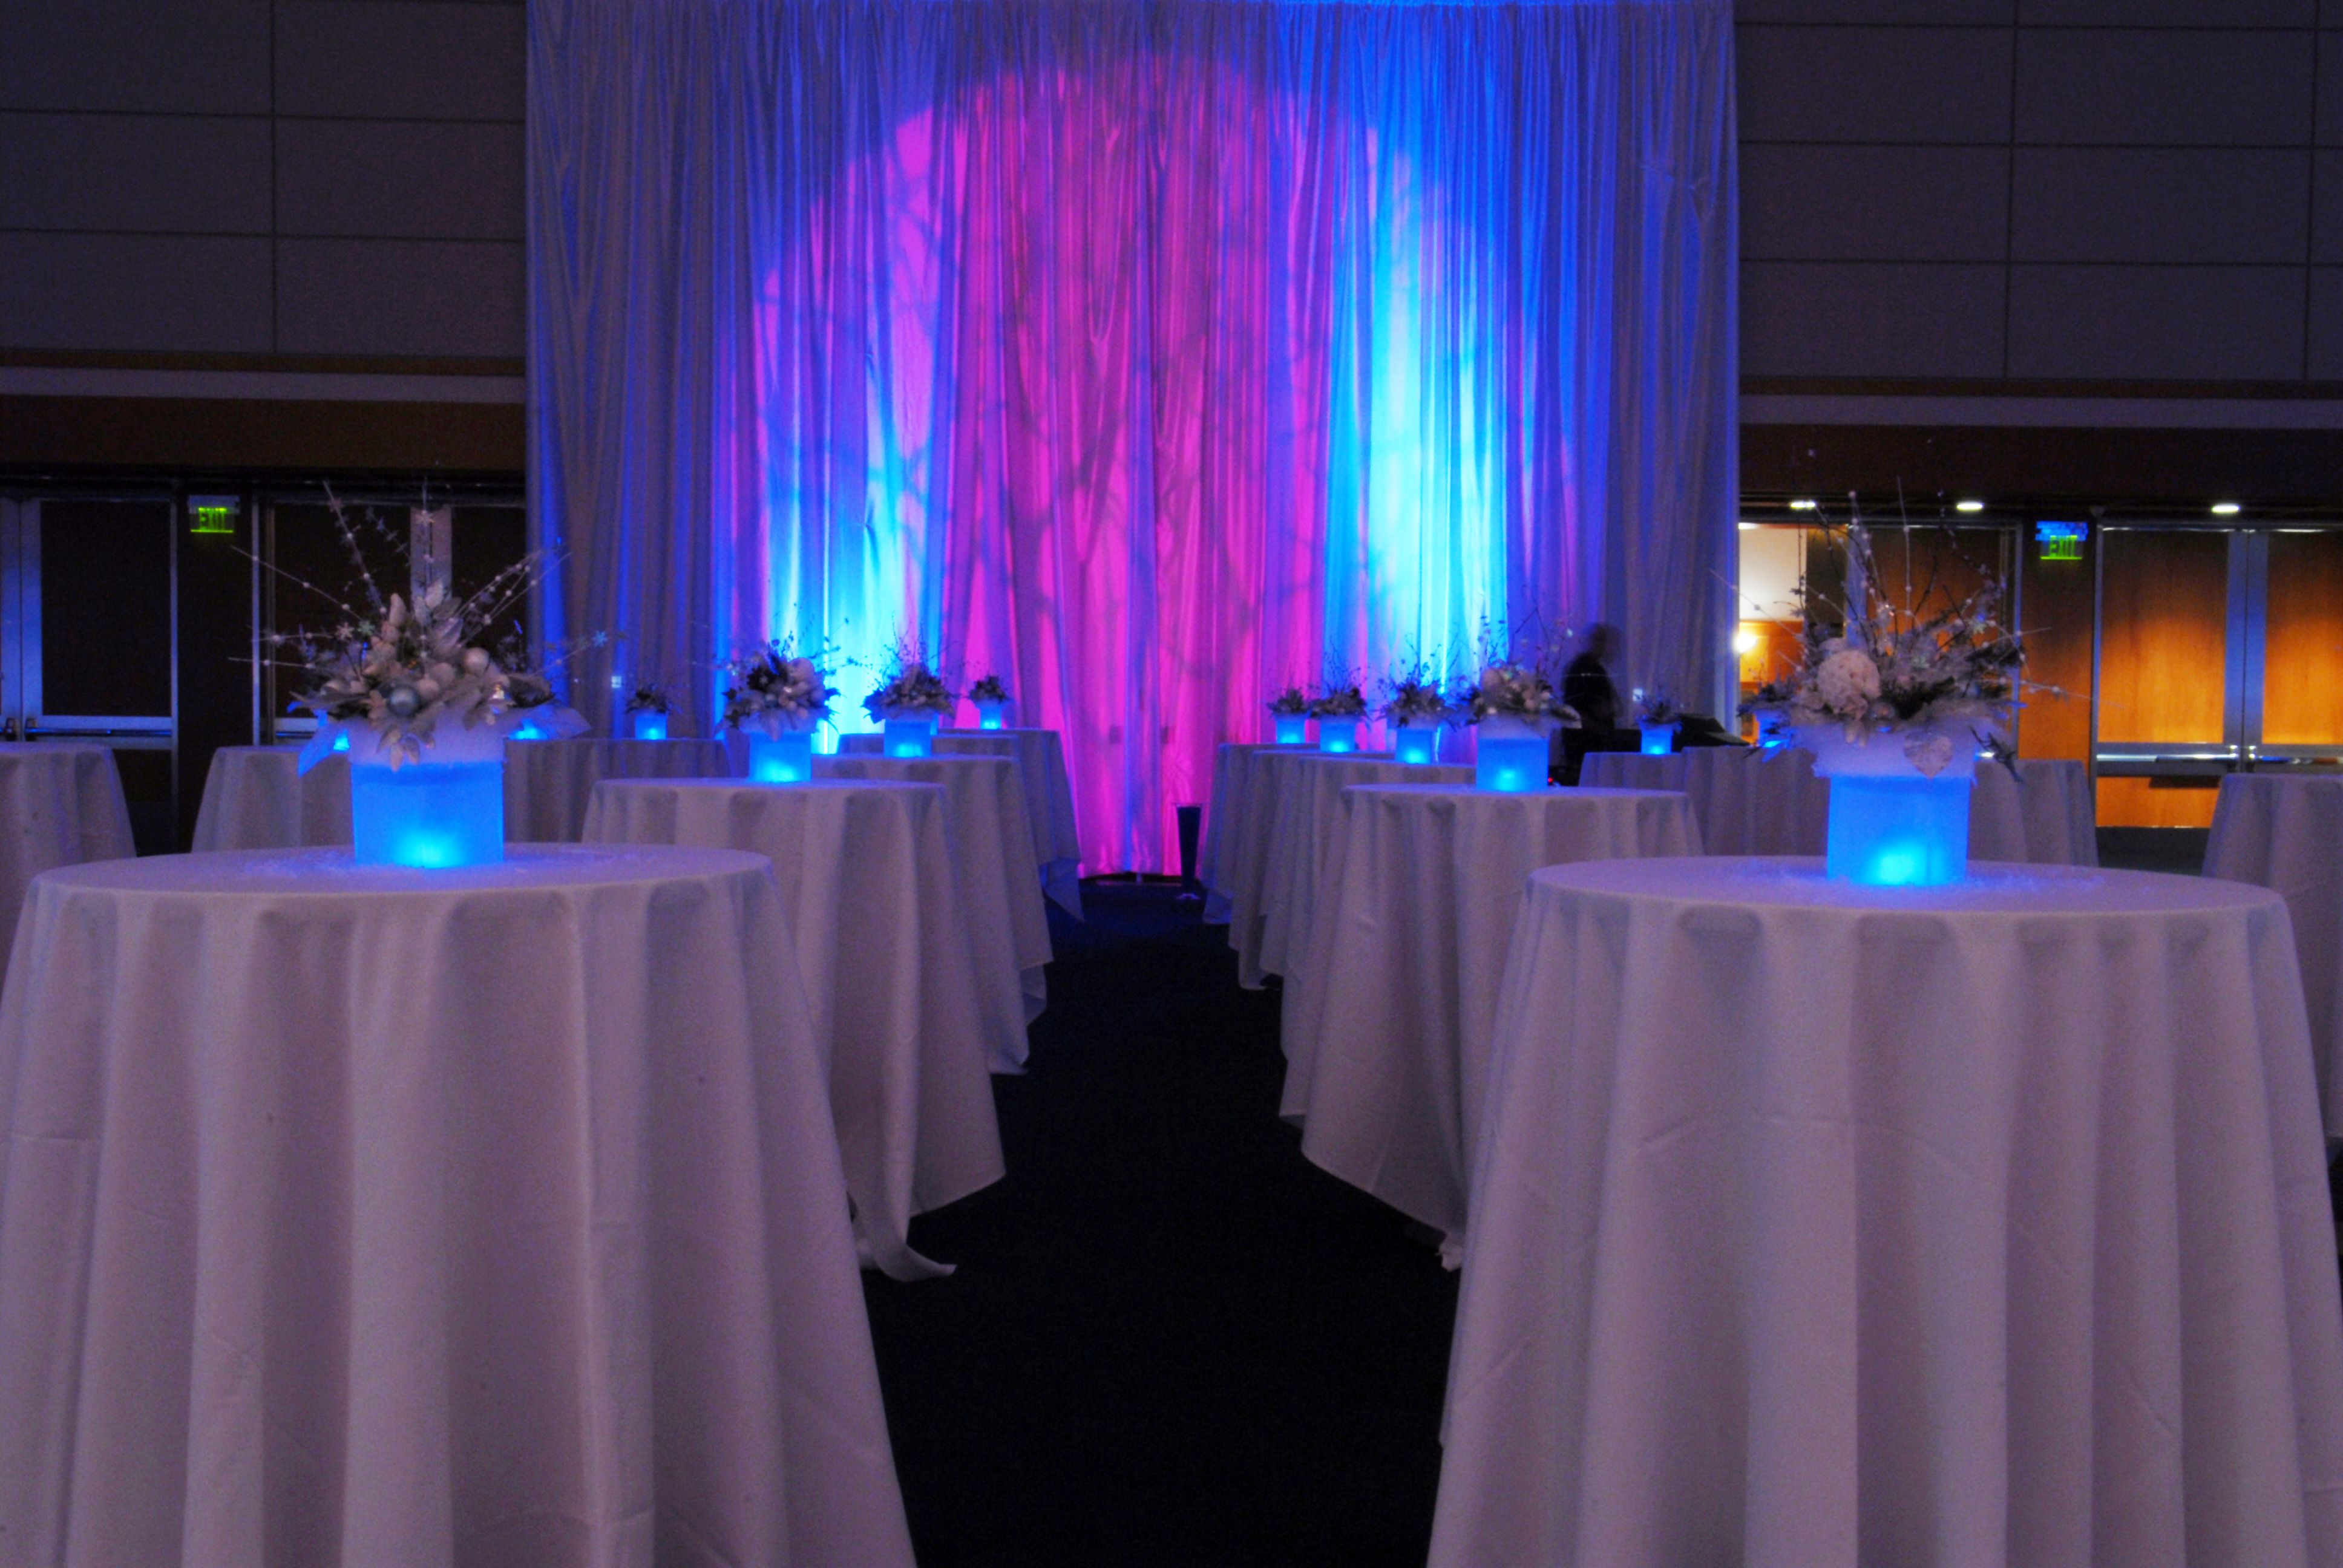 amazing corporate event floral design dcor - Event Decorations